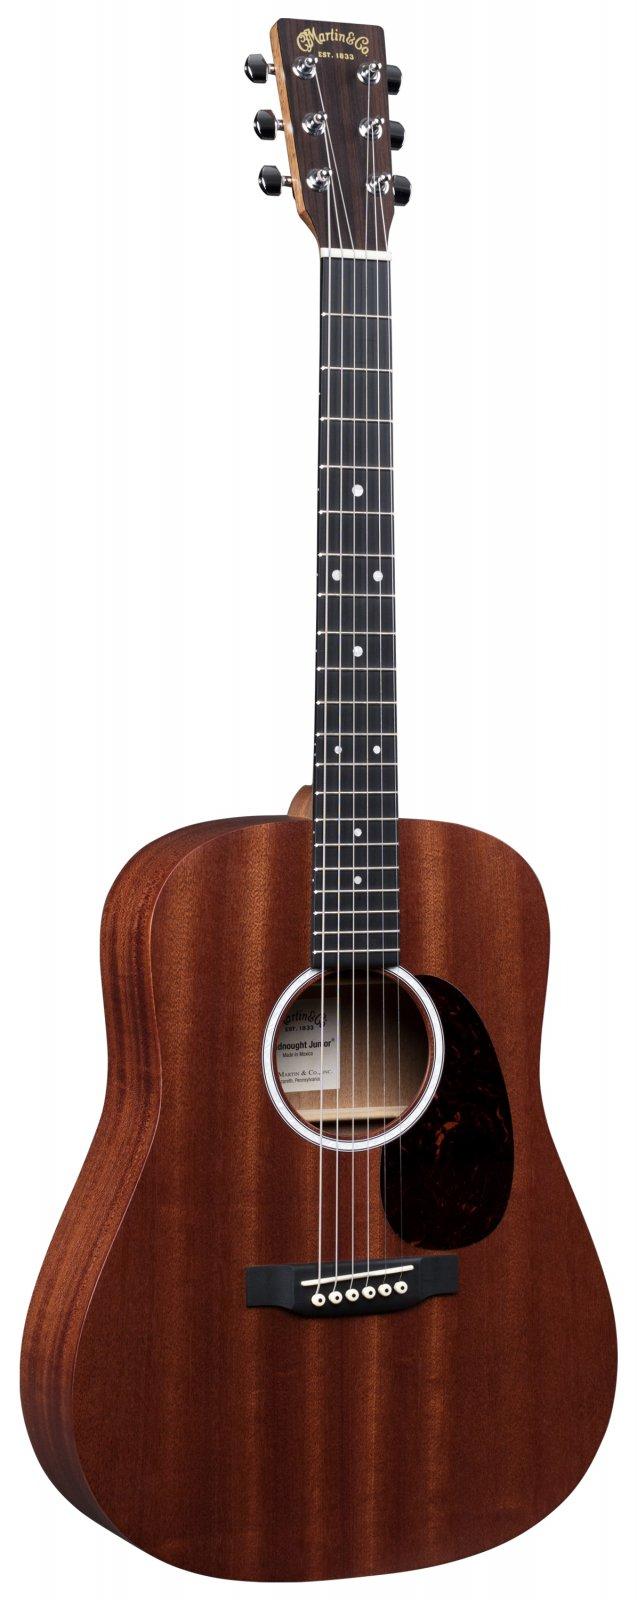 Martin DJR-10 Dreadnought Jr. Acoustic w/ Gig Bag & Pro Setup